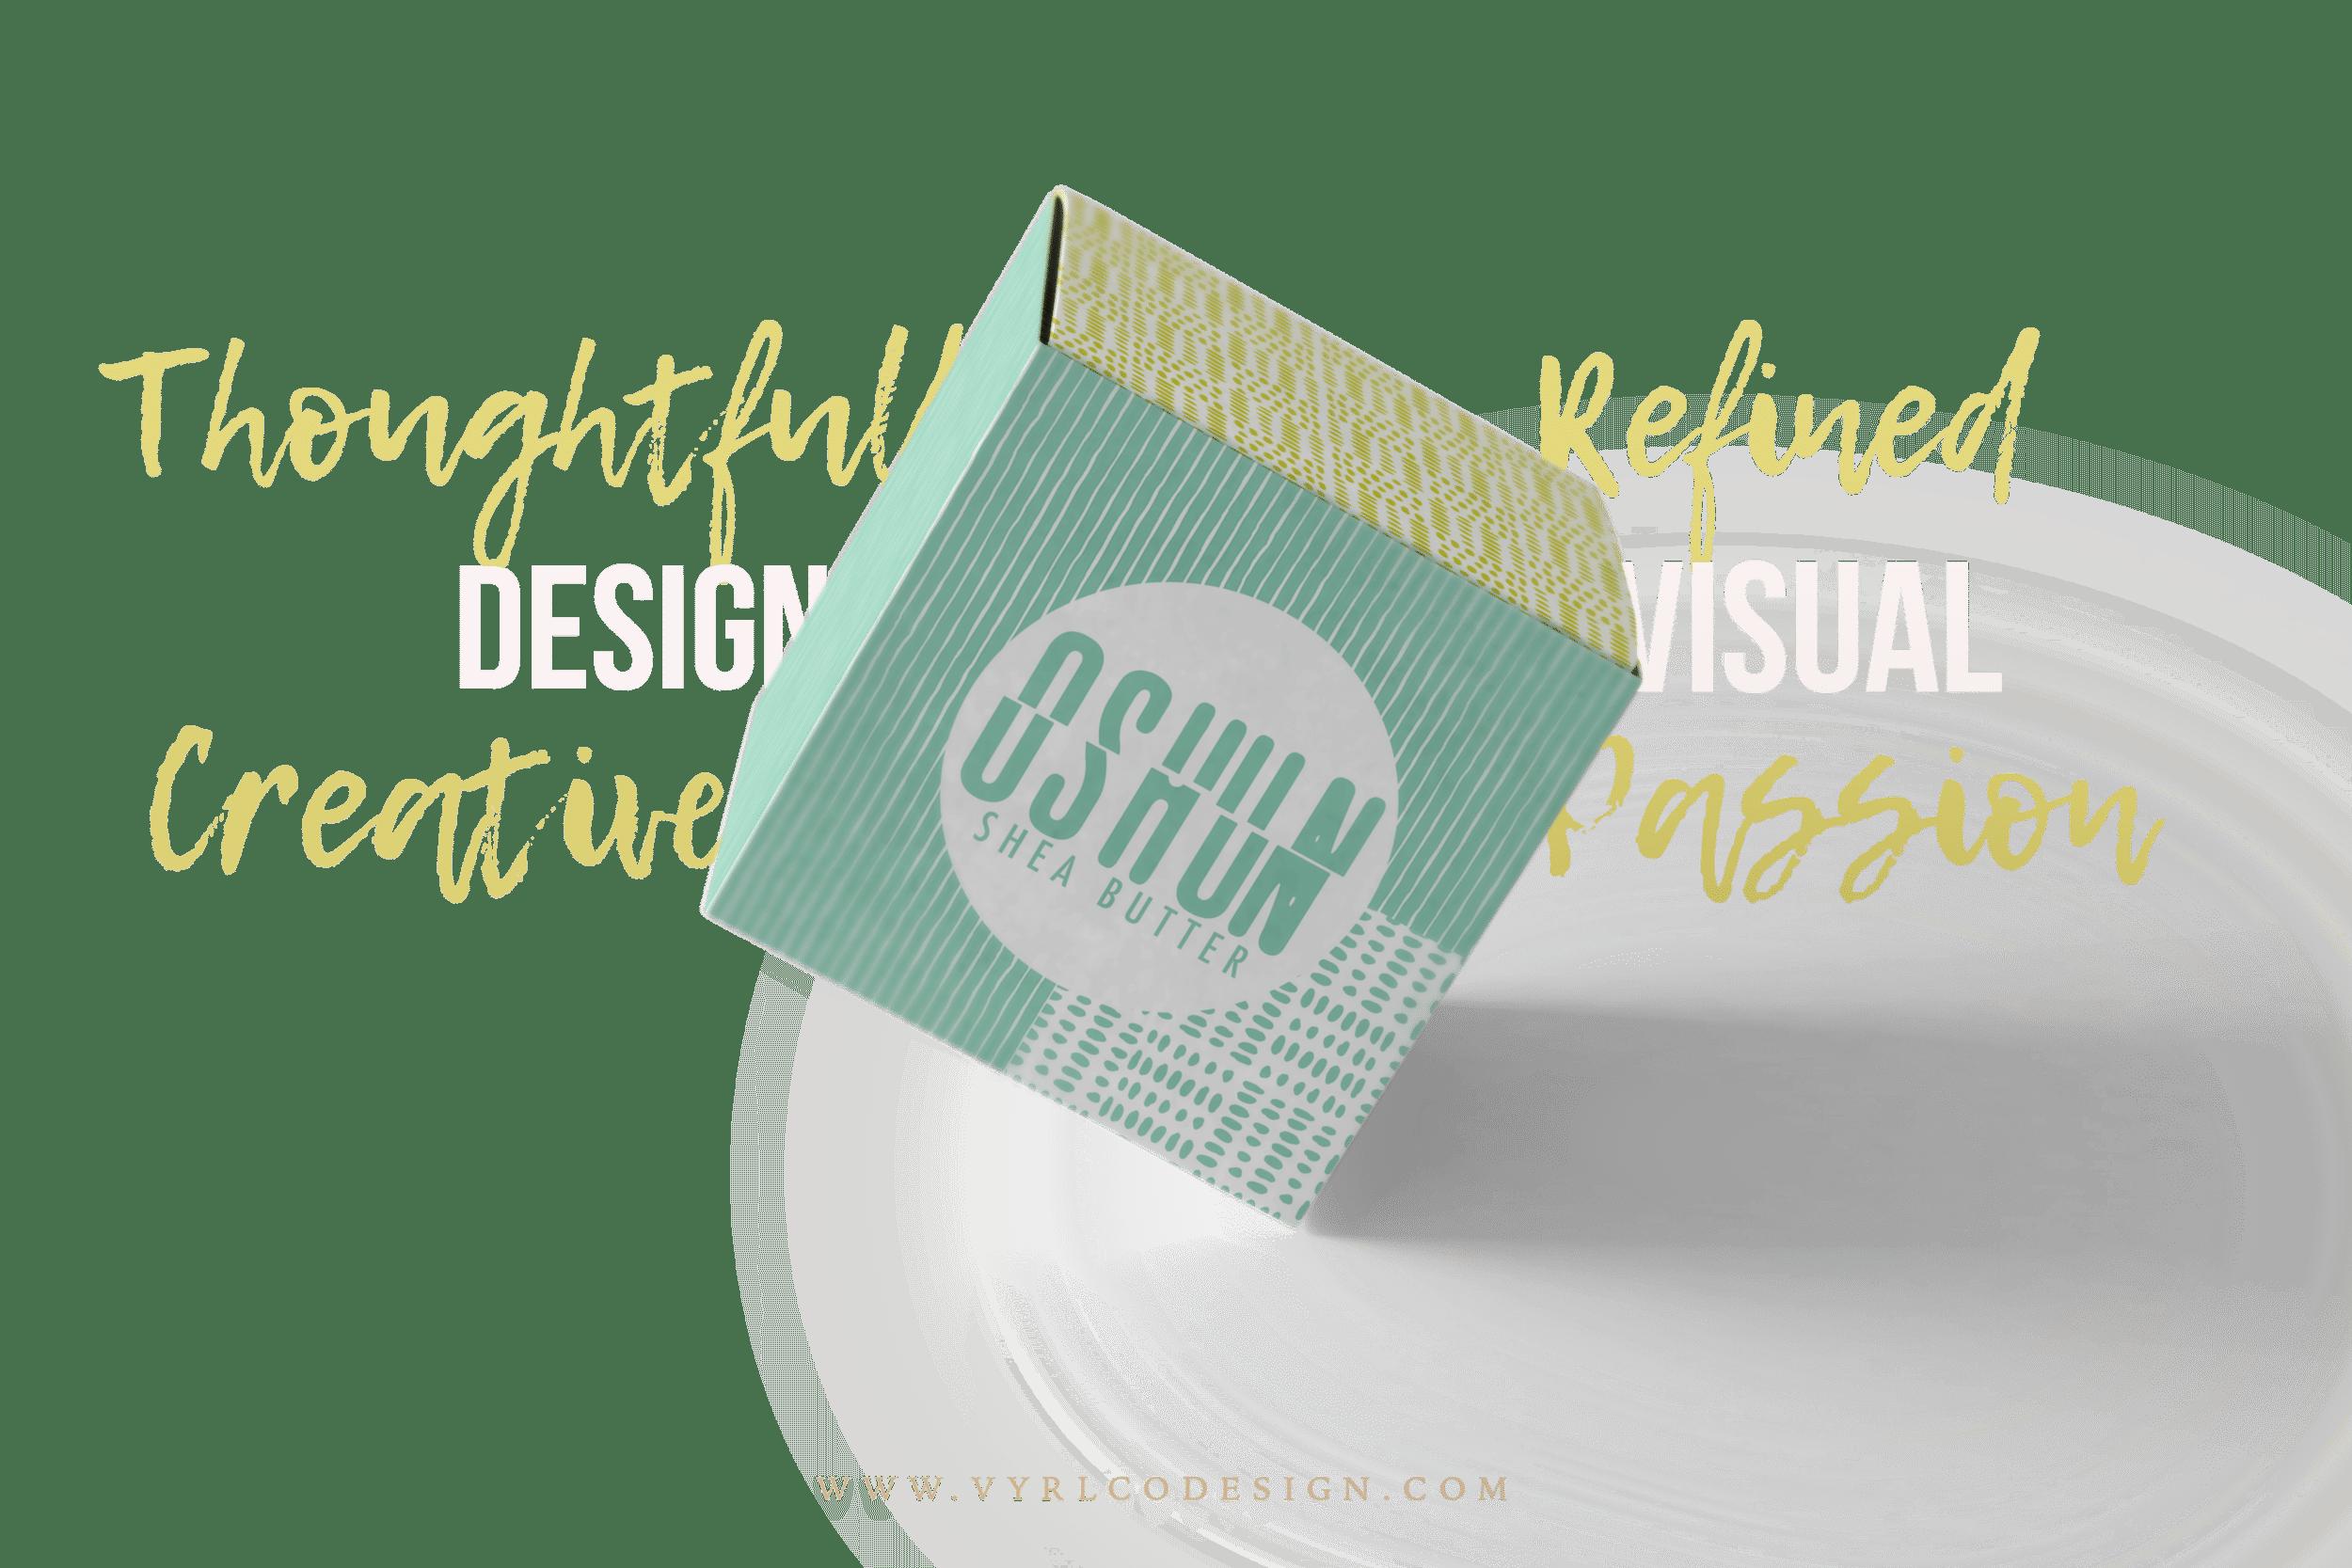 jasmine oliver black web designer